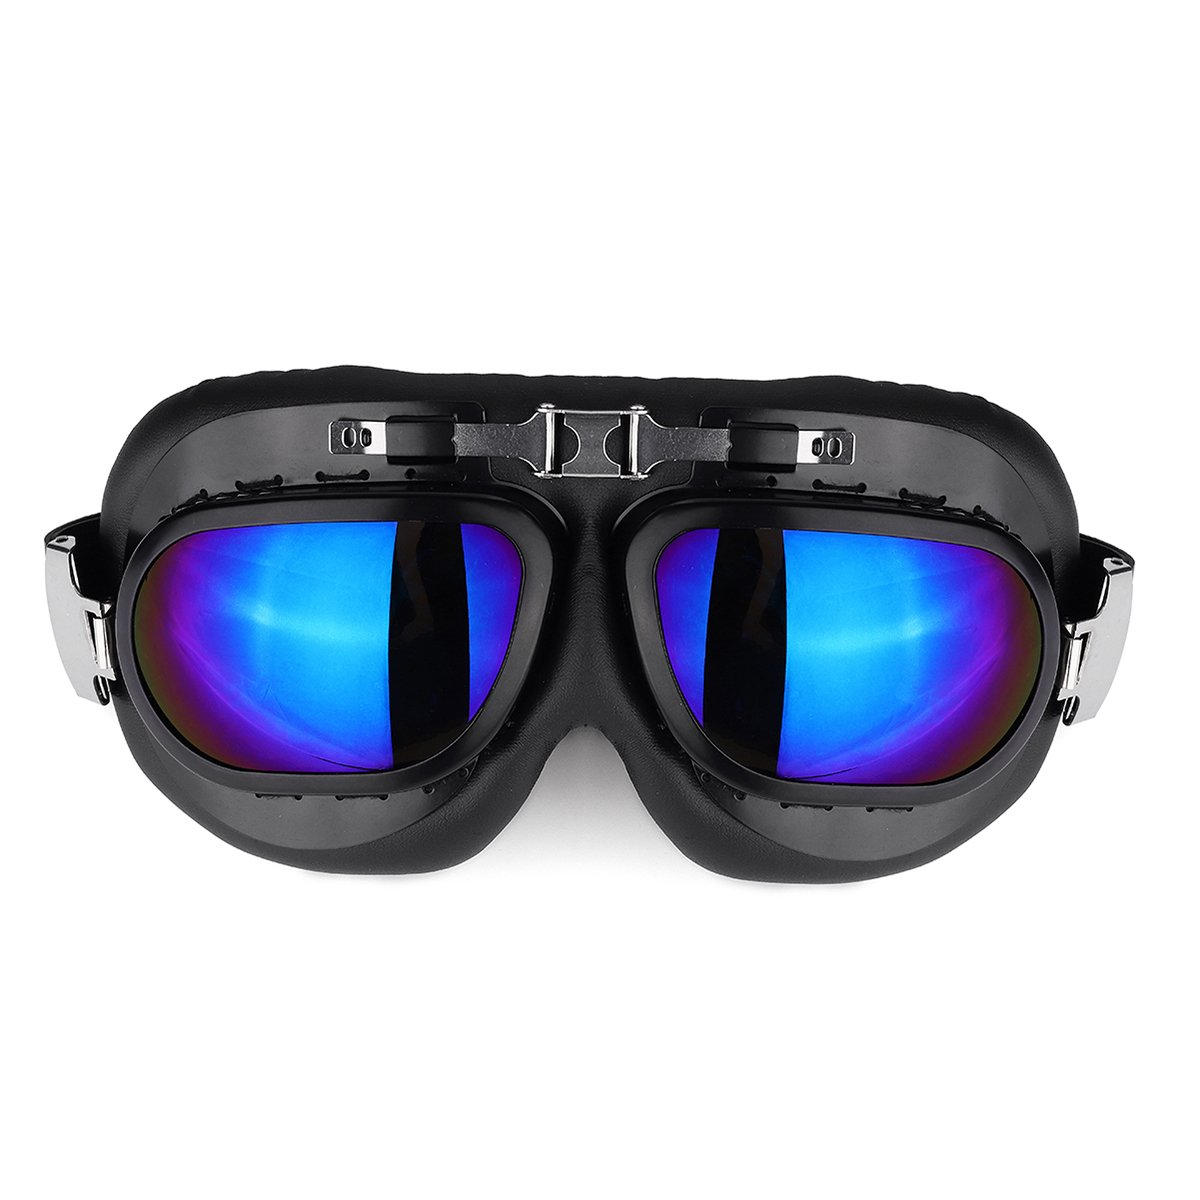 Amarillo Alamor Gafas De Motos Gafas Vintage Classic Gafas Retro Pilot Cruiser Steampunk UV Protecti